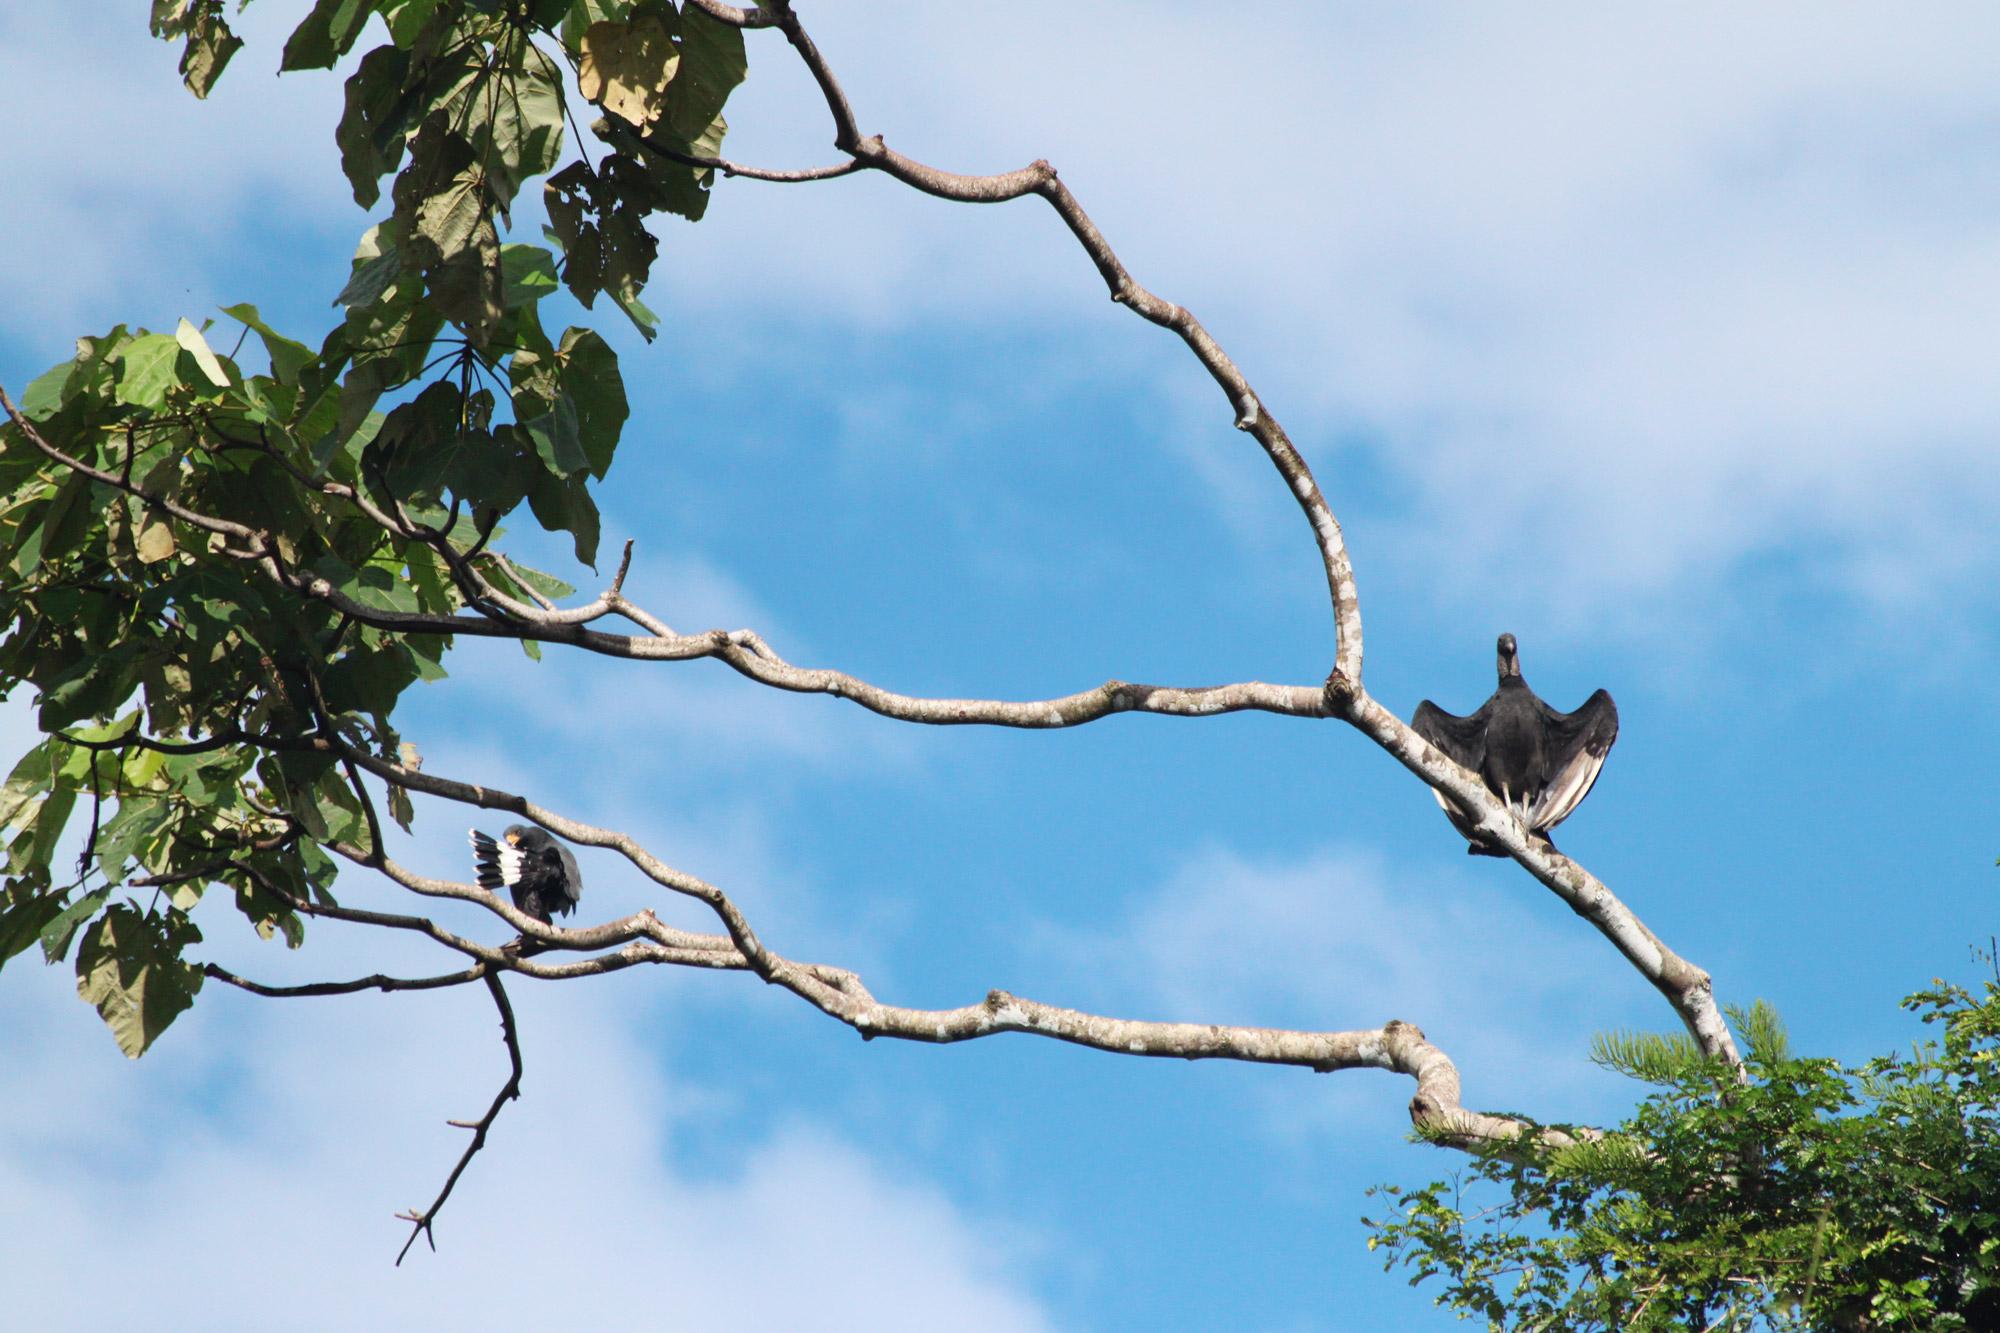 Costa Rica 2014 - dag 16 - Parque Nacional Corcovado